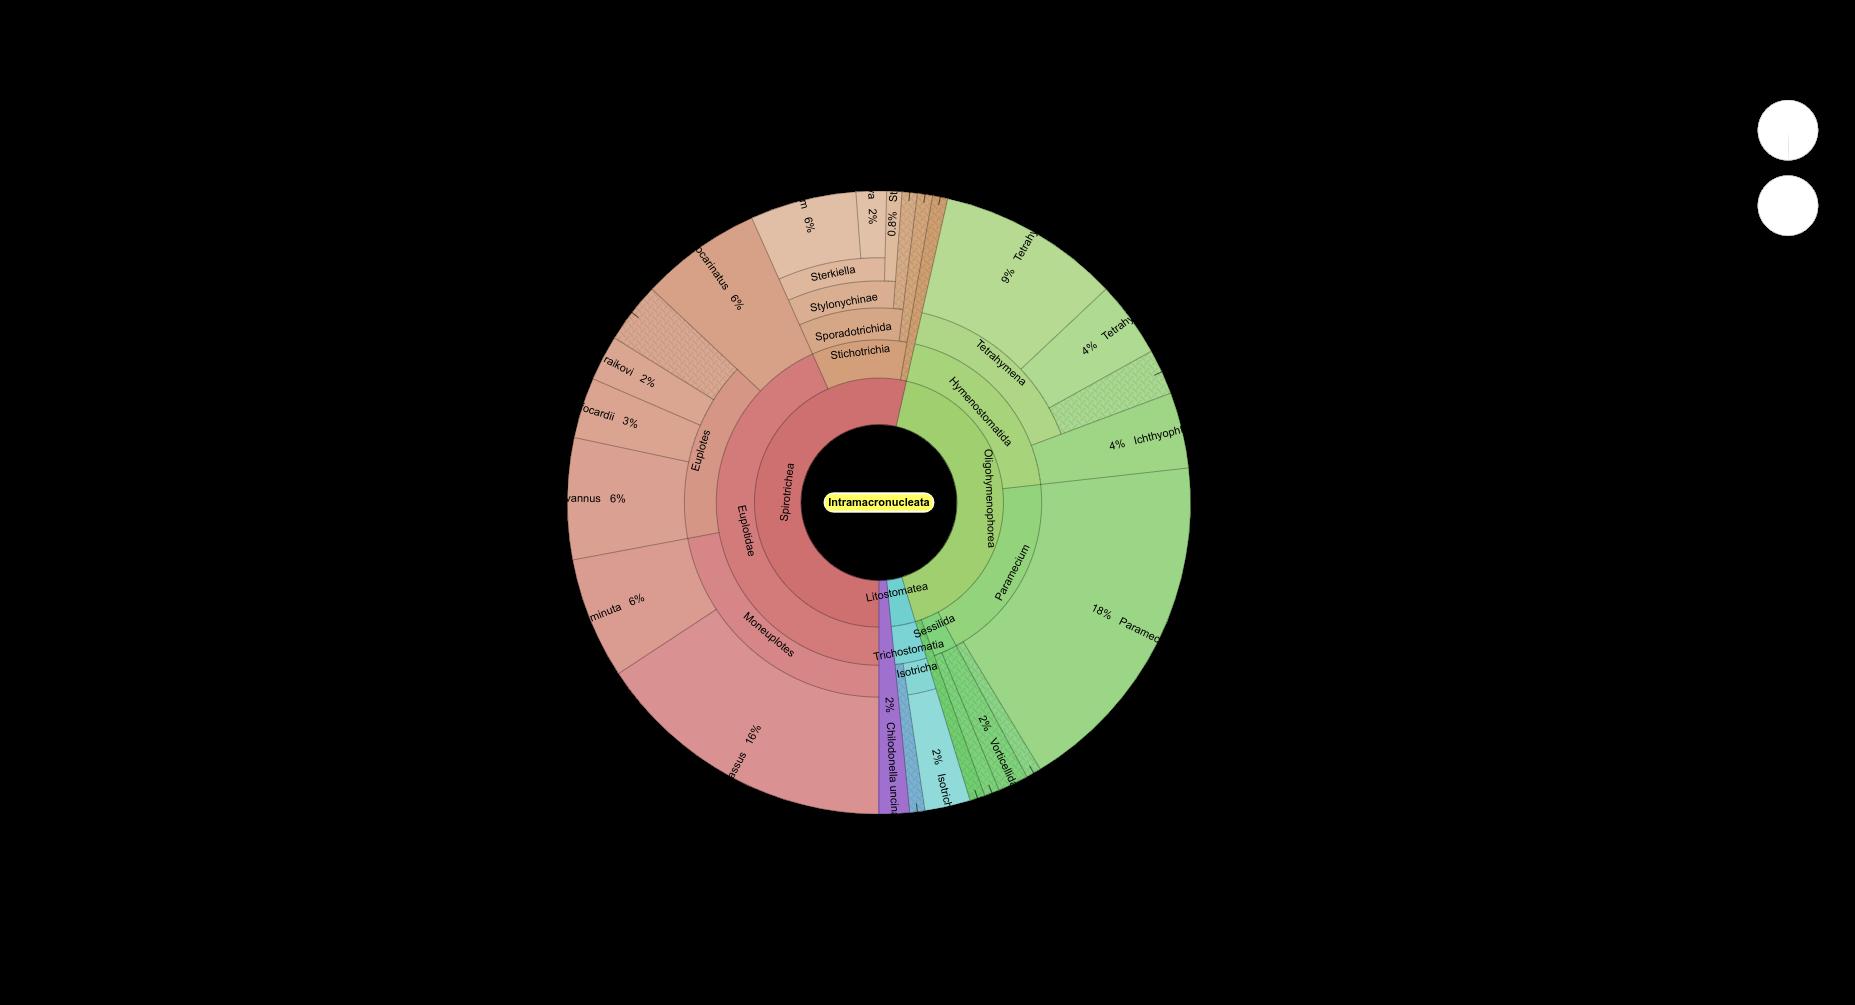 pH=7.1 Intramacronucleata krona plot